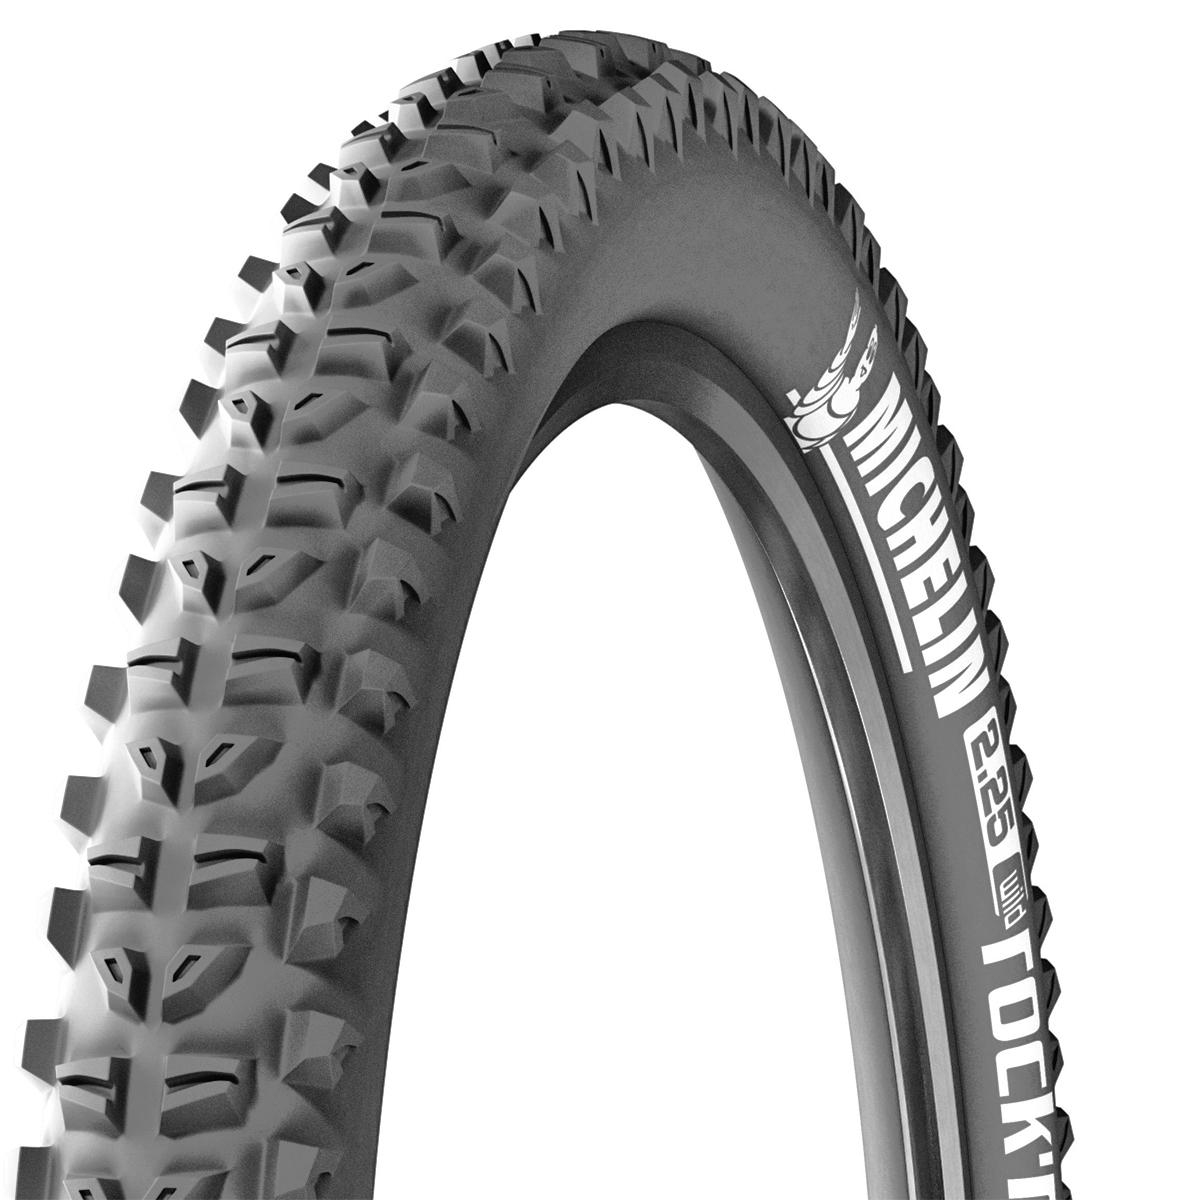 Pneu 26 x 2.40 Michelin Wild Rock'R renforcé (TS - TLR)